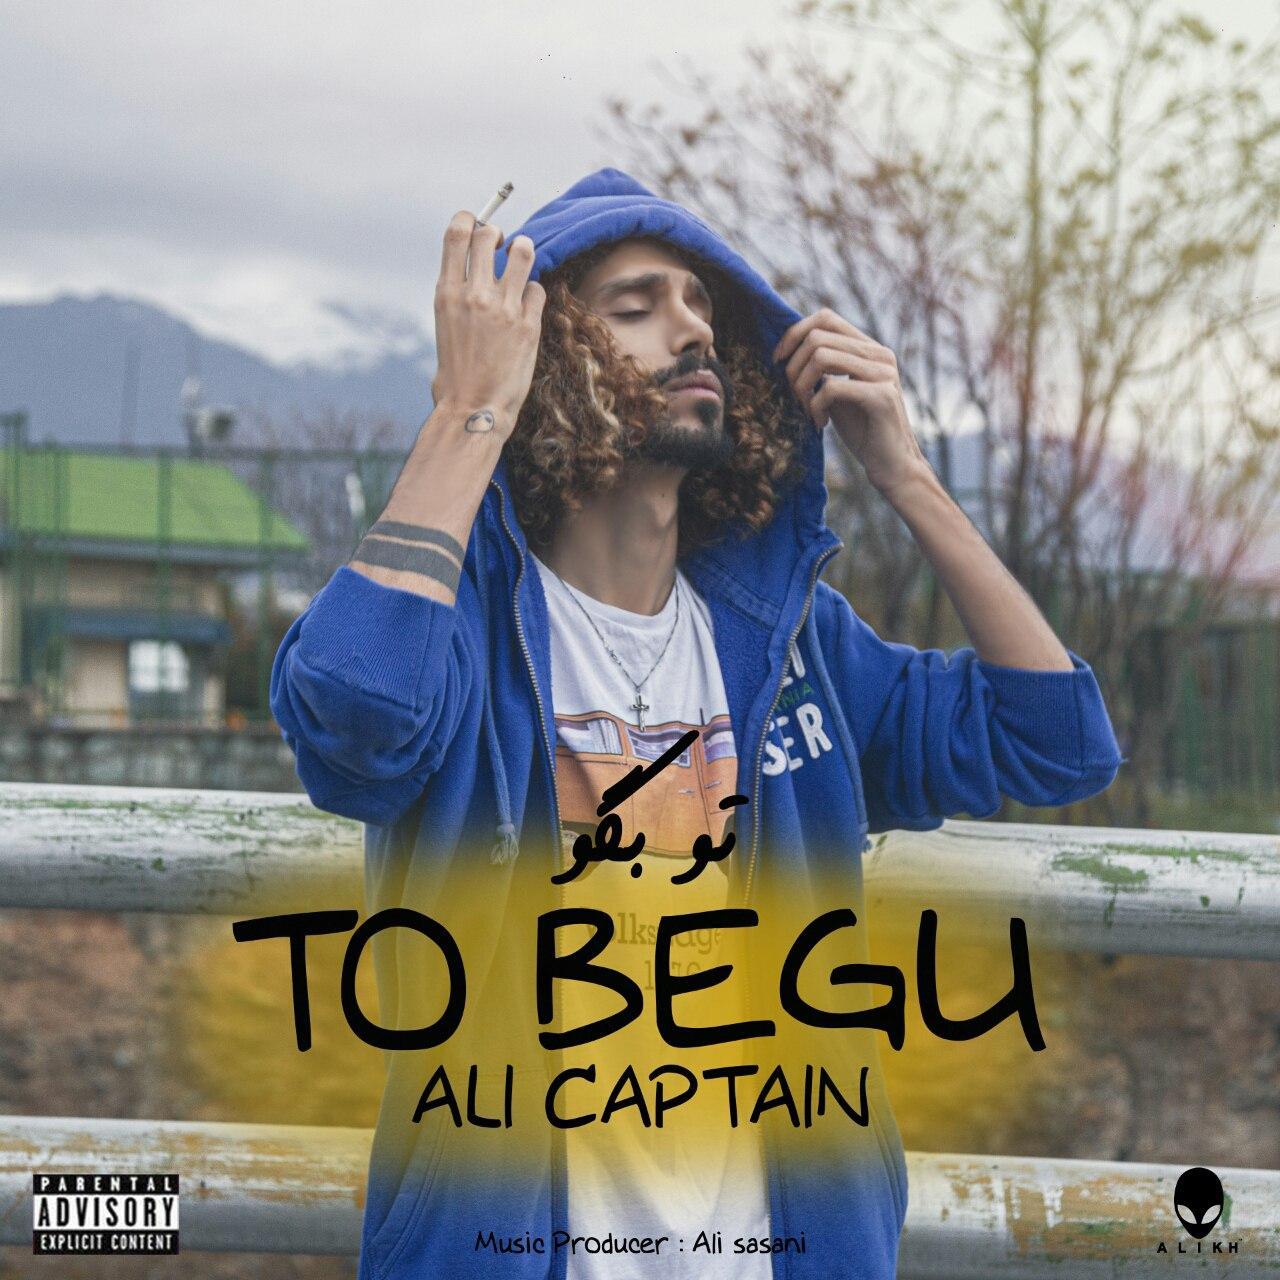 Ali Captain – To Begu